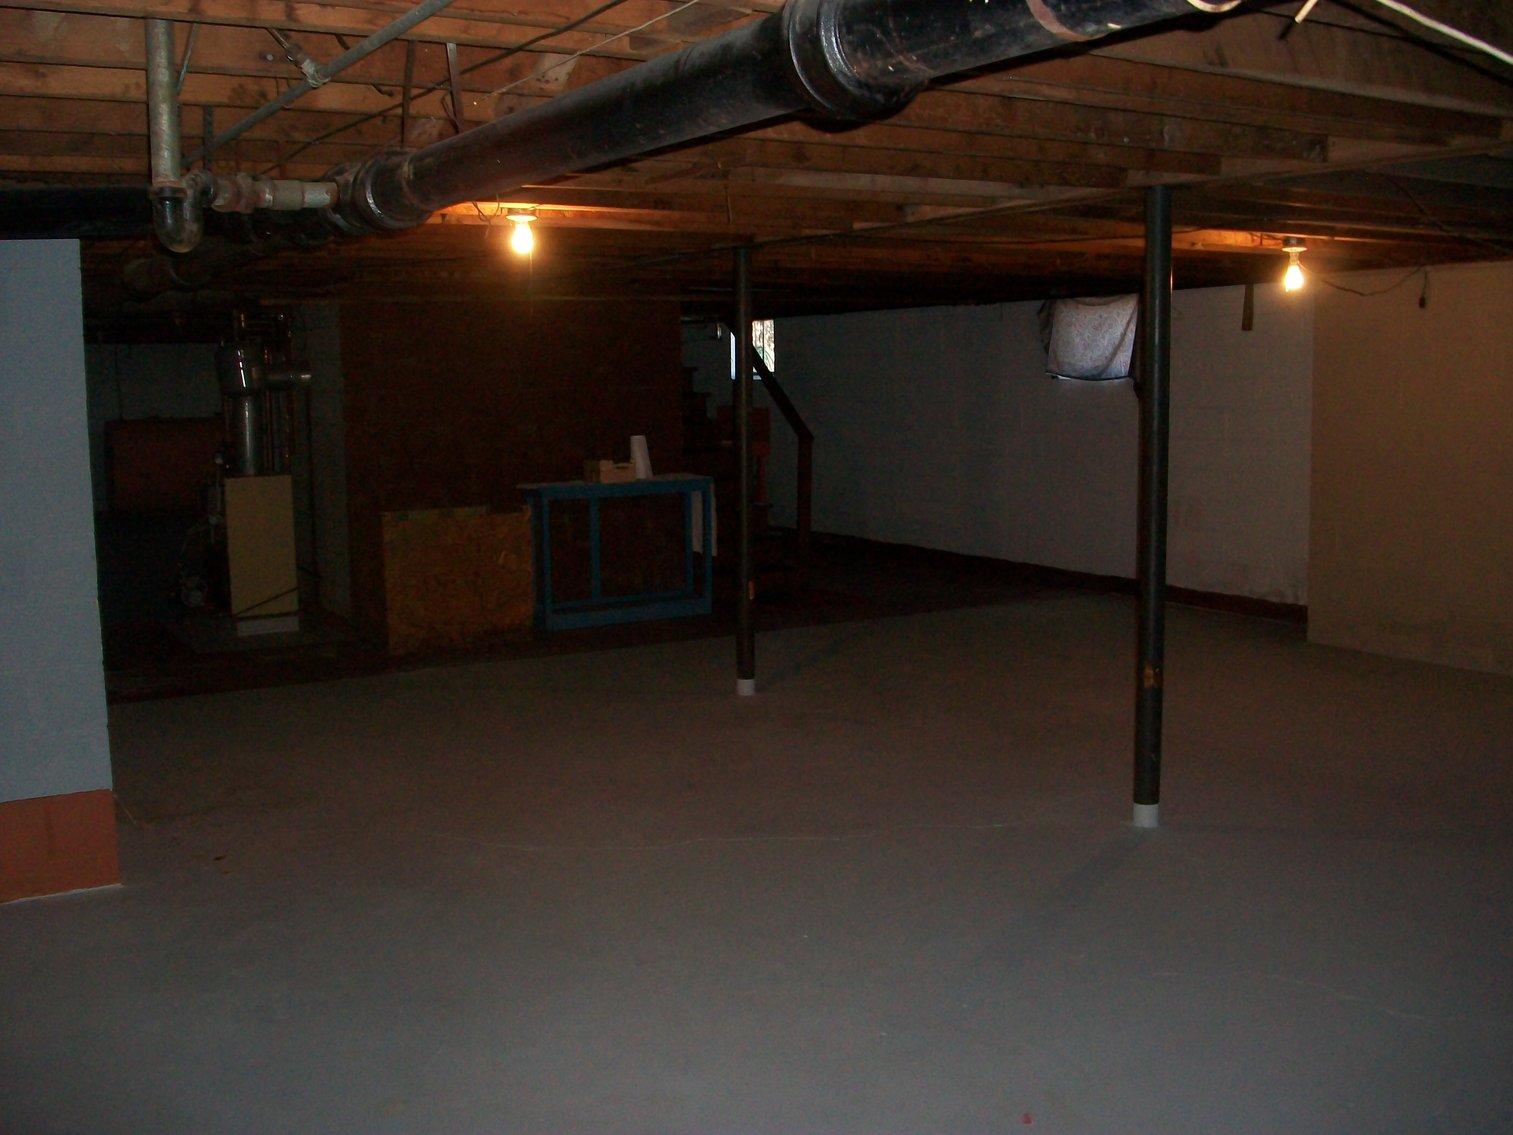 Image for REAL ESTATE AUCTION - 2.87± Acres (Staunton, VA)